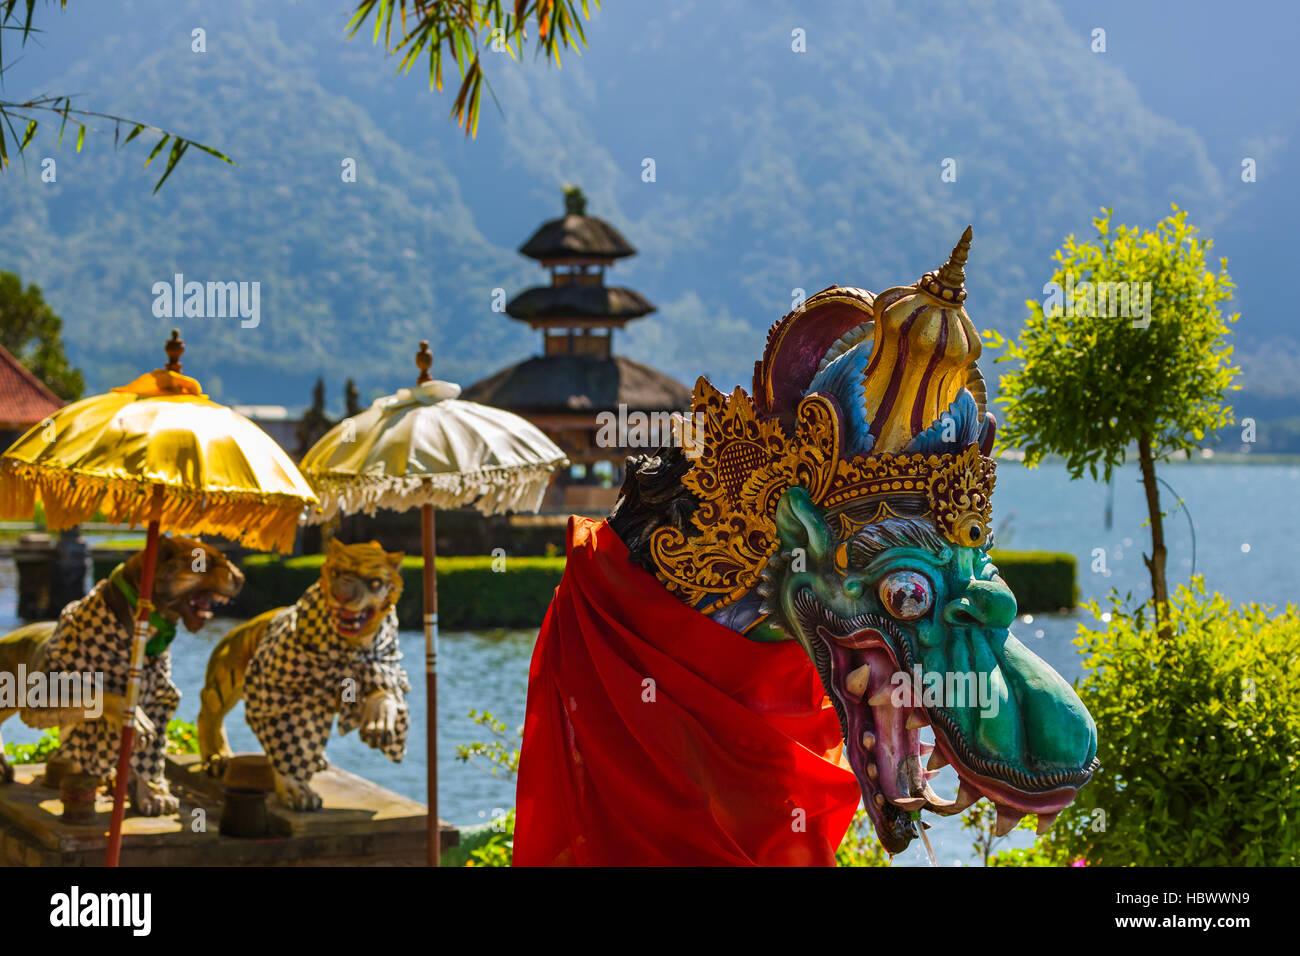 Templo Ulun Danu - isla de Bali Indonesia Imagen De Stock